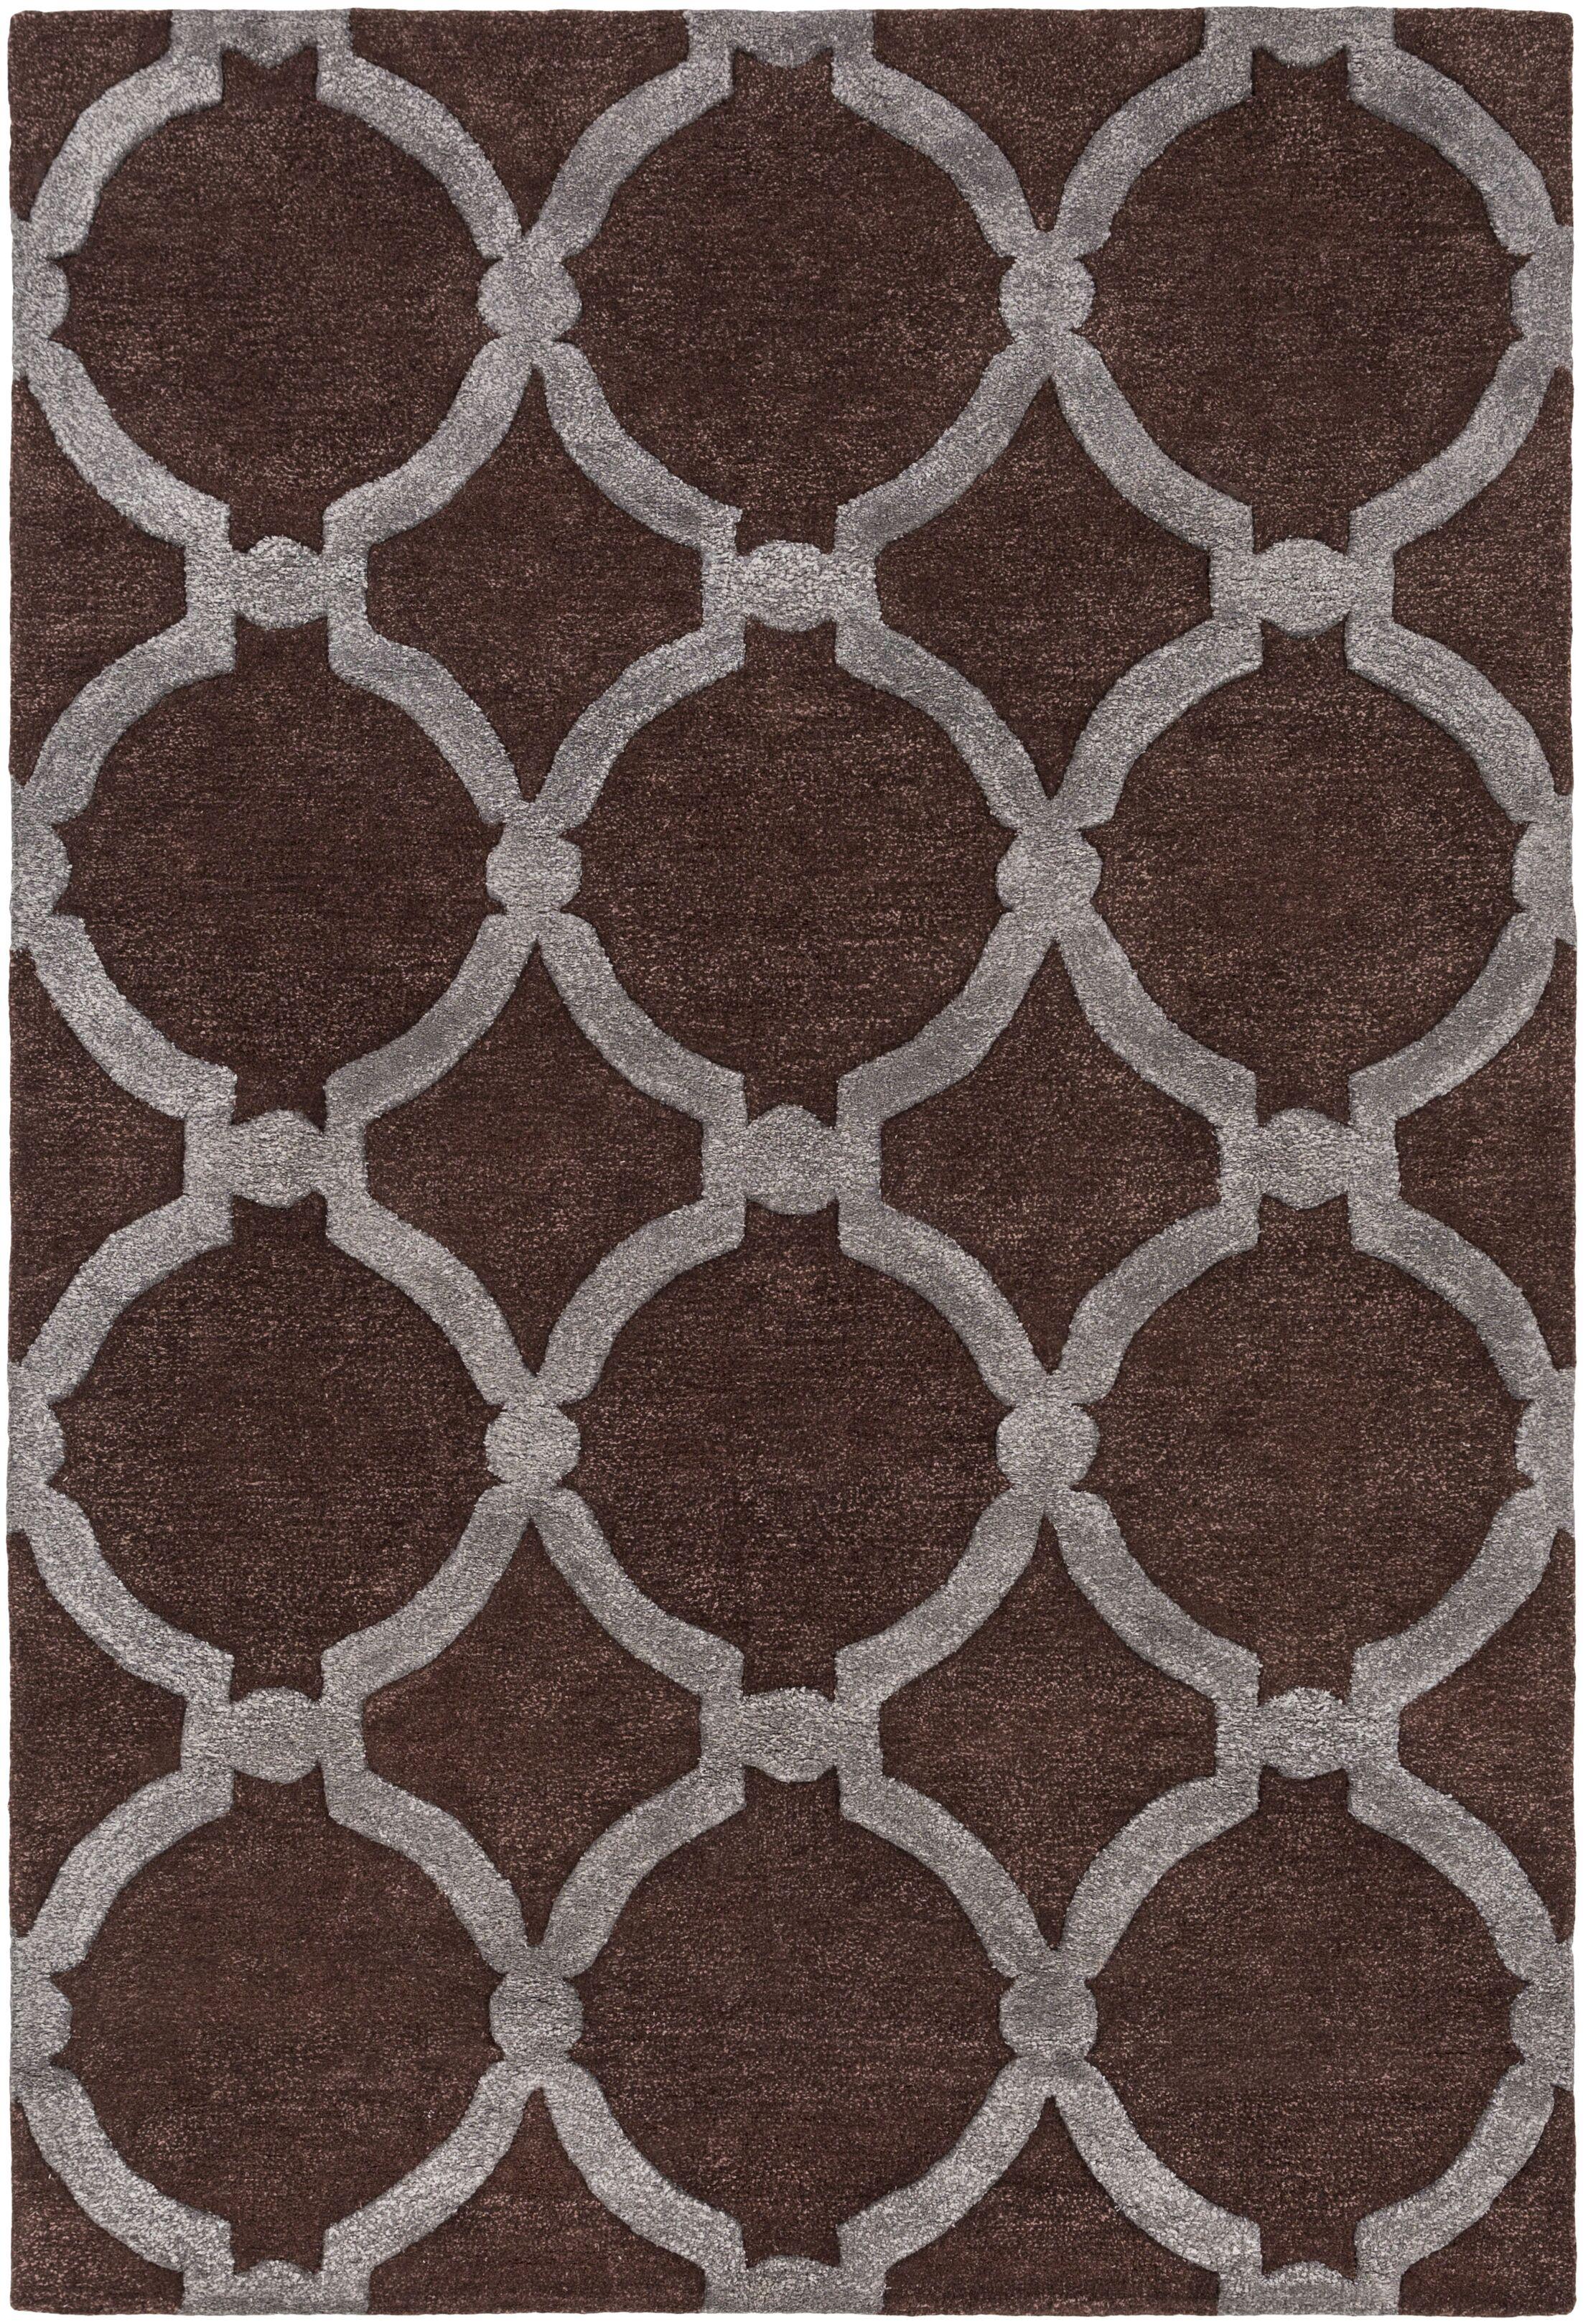 Labastide Hand-Tufted Brown Area Rug Rug Size: Rectangle 8' x 11'